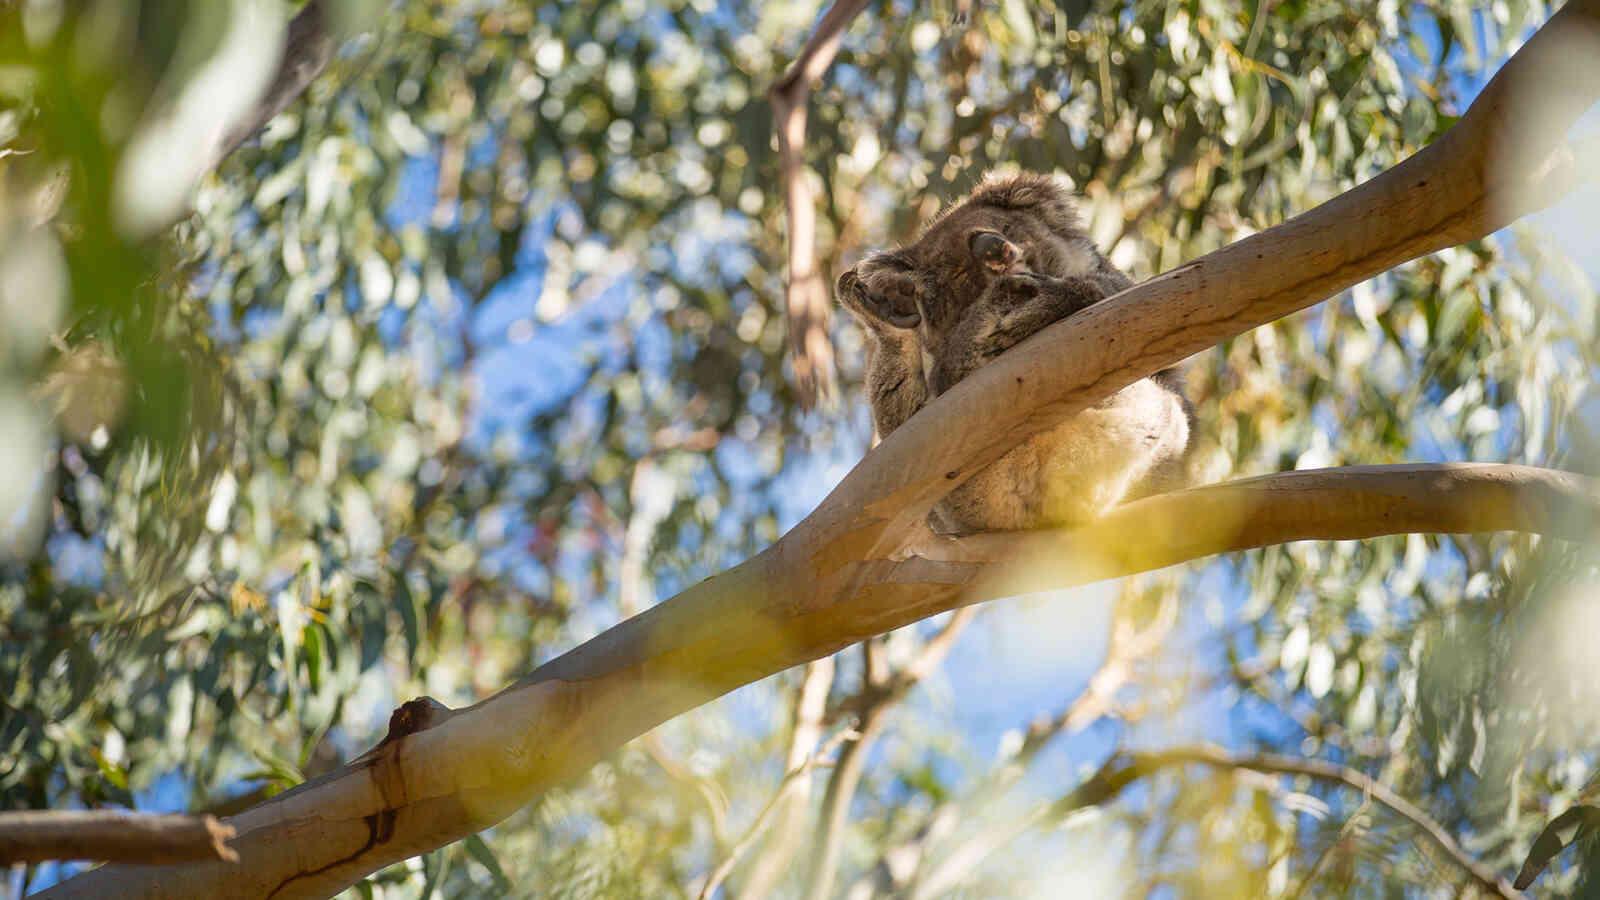 Koala 1920X1200Px